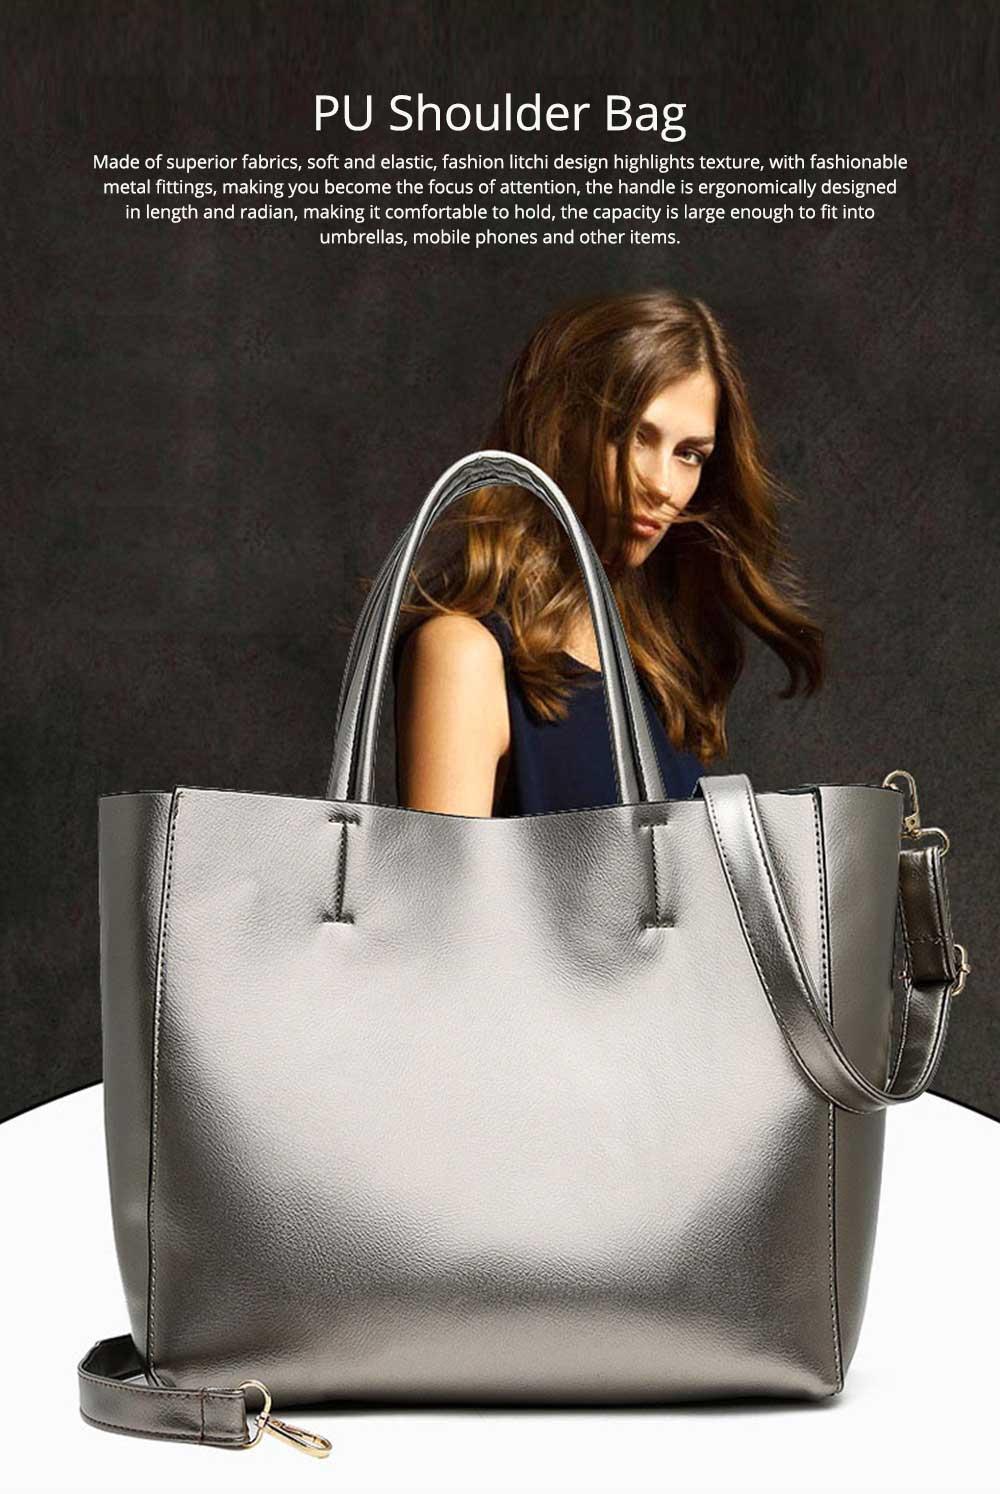 Elegant Tote Bag Shoulder Bag, Retro PU Leather Fashion Litchi Grain Large Size Clutch Bags, 2019 Fashion Handbag with Purse 0